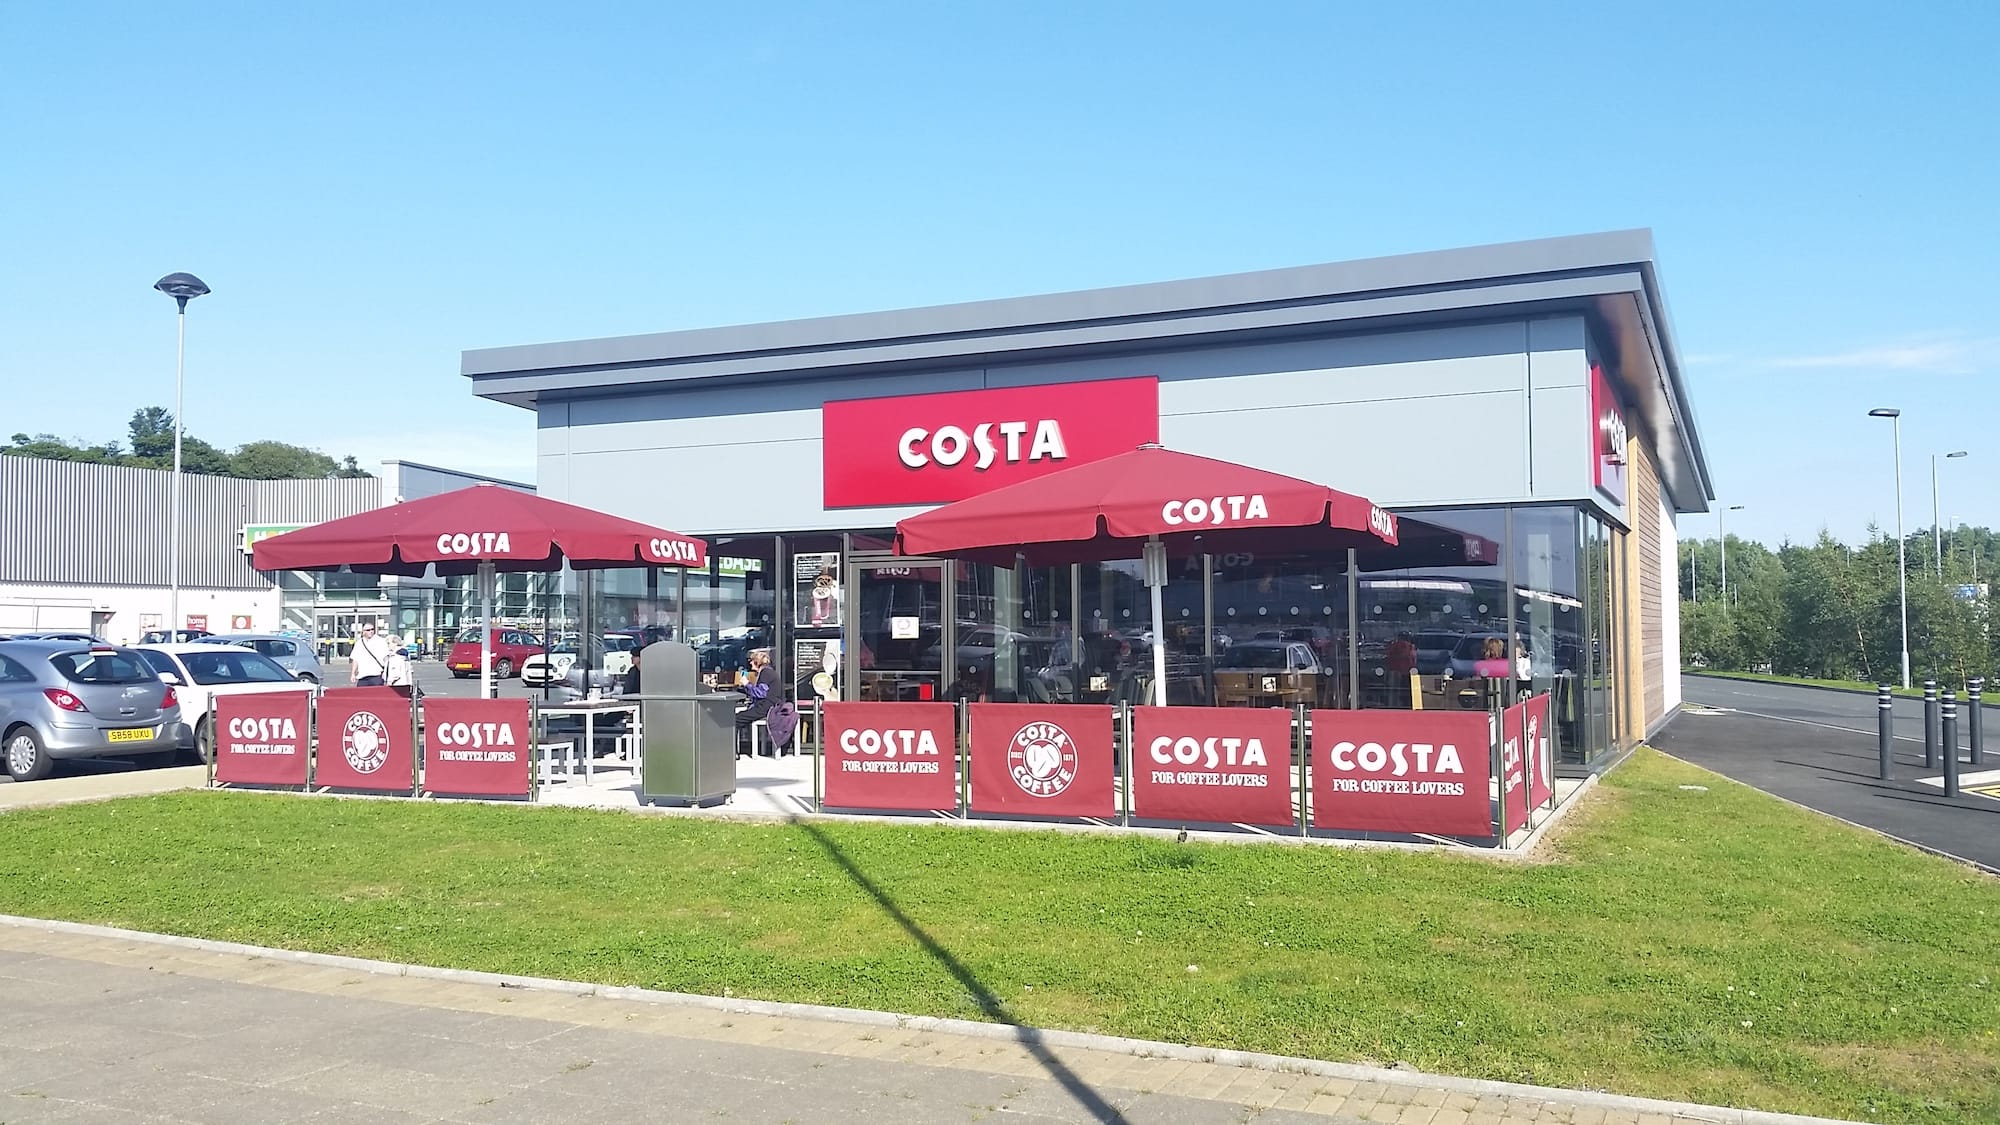 Costa On Site At Nether Auldhouse Retail Park Glasgow Ediston